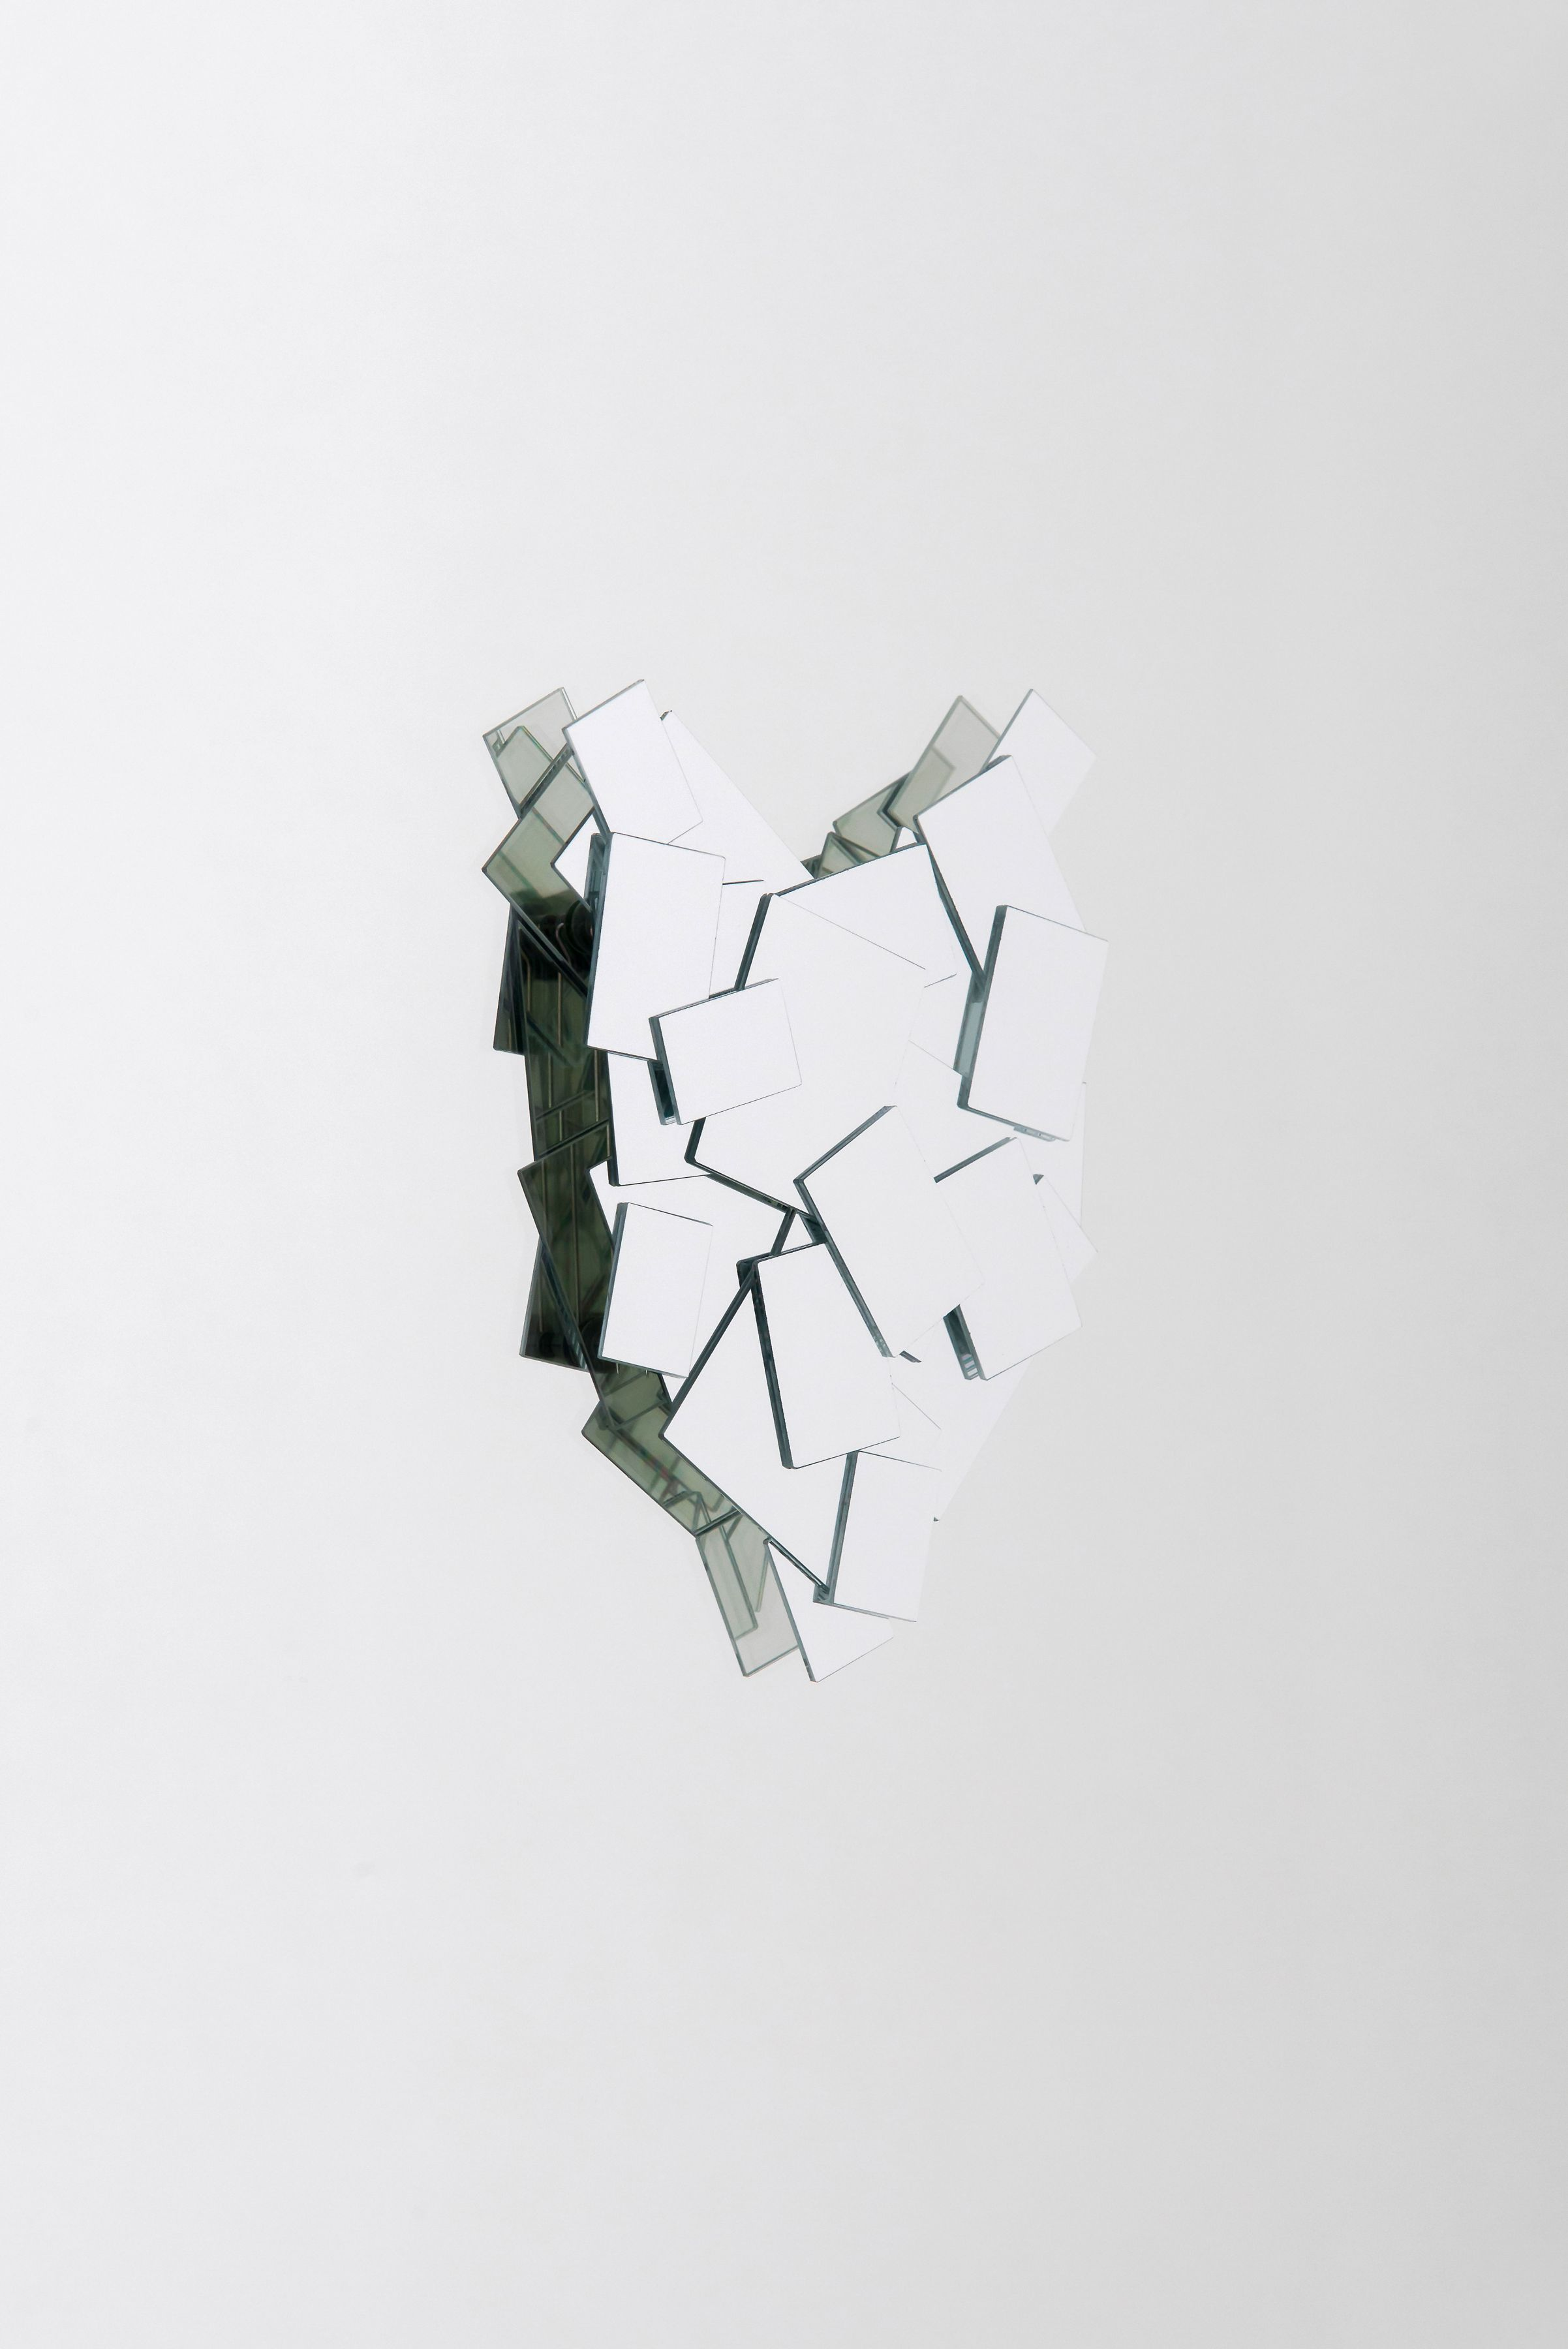 Jiro Kamata, glass jewelry, contemporary, dichroic mirror, necklace, ghost